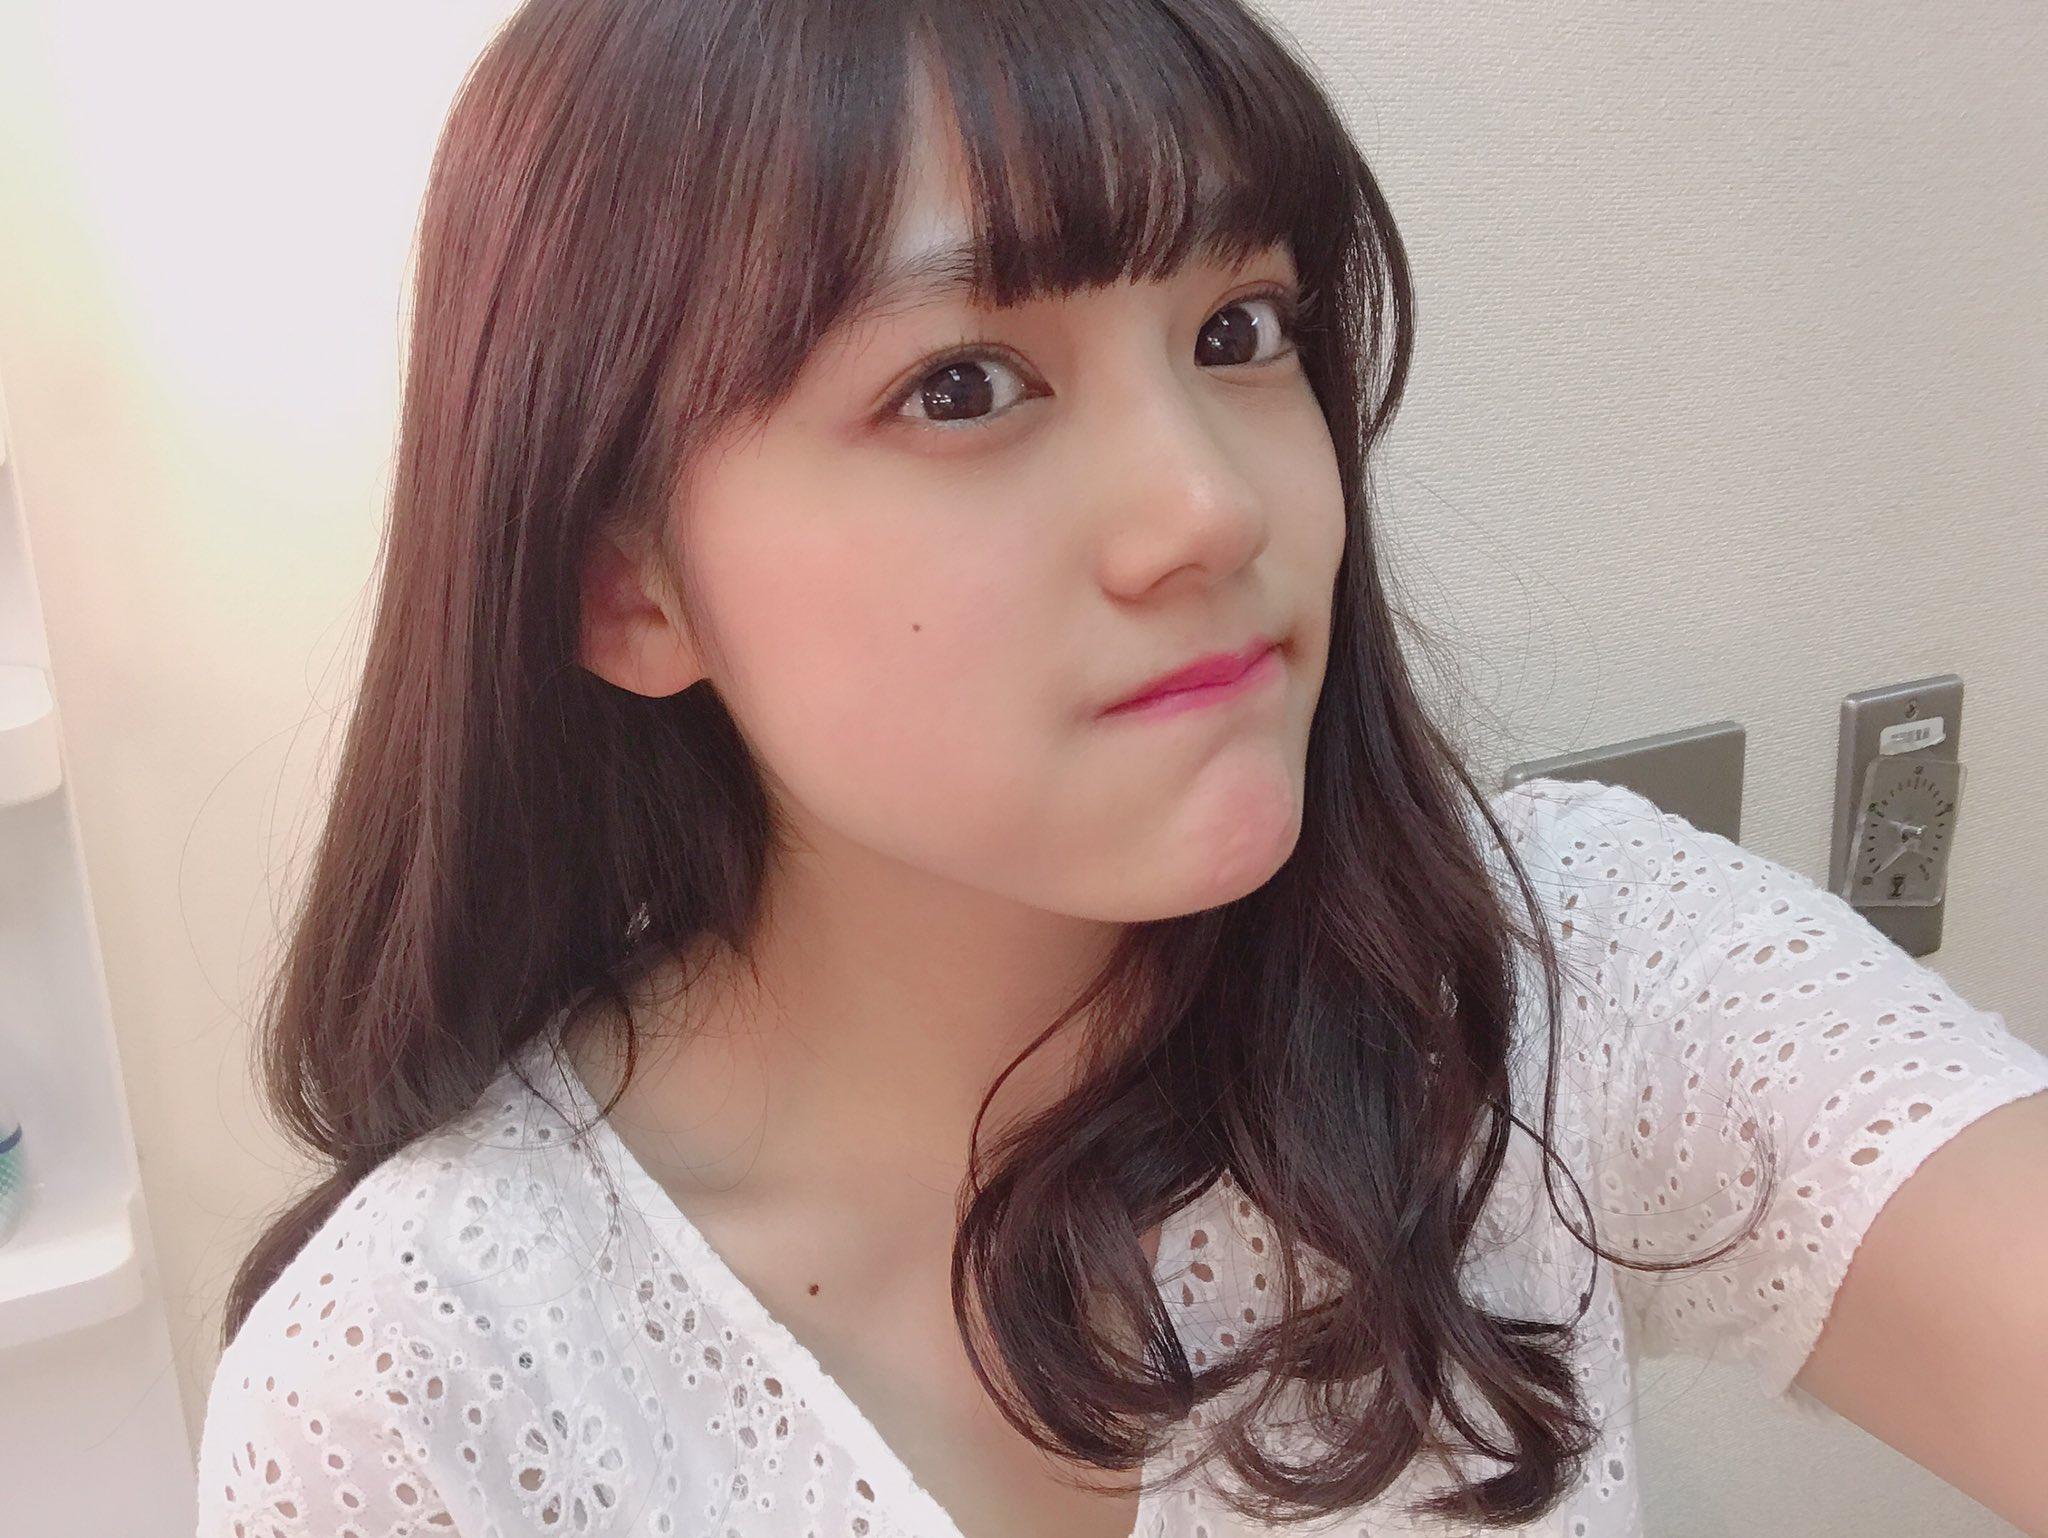 Haraeki Stage A (原駅ステージA), Taya Nanako (田谷菜々子)